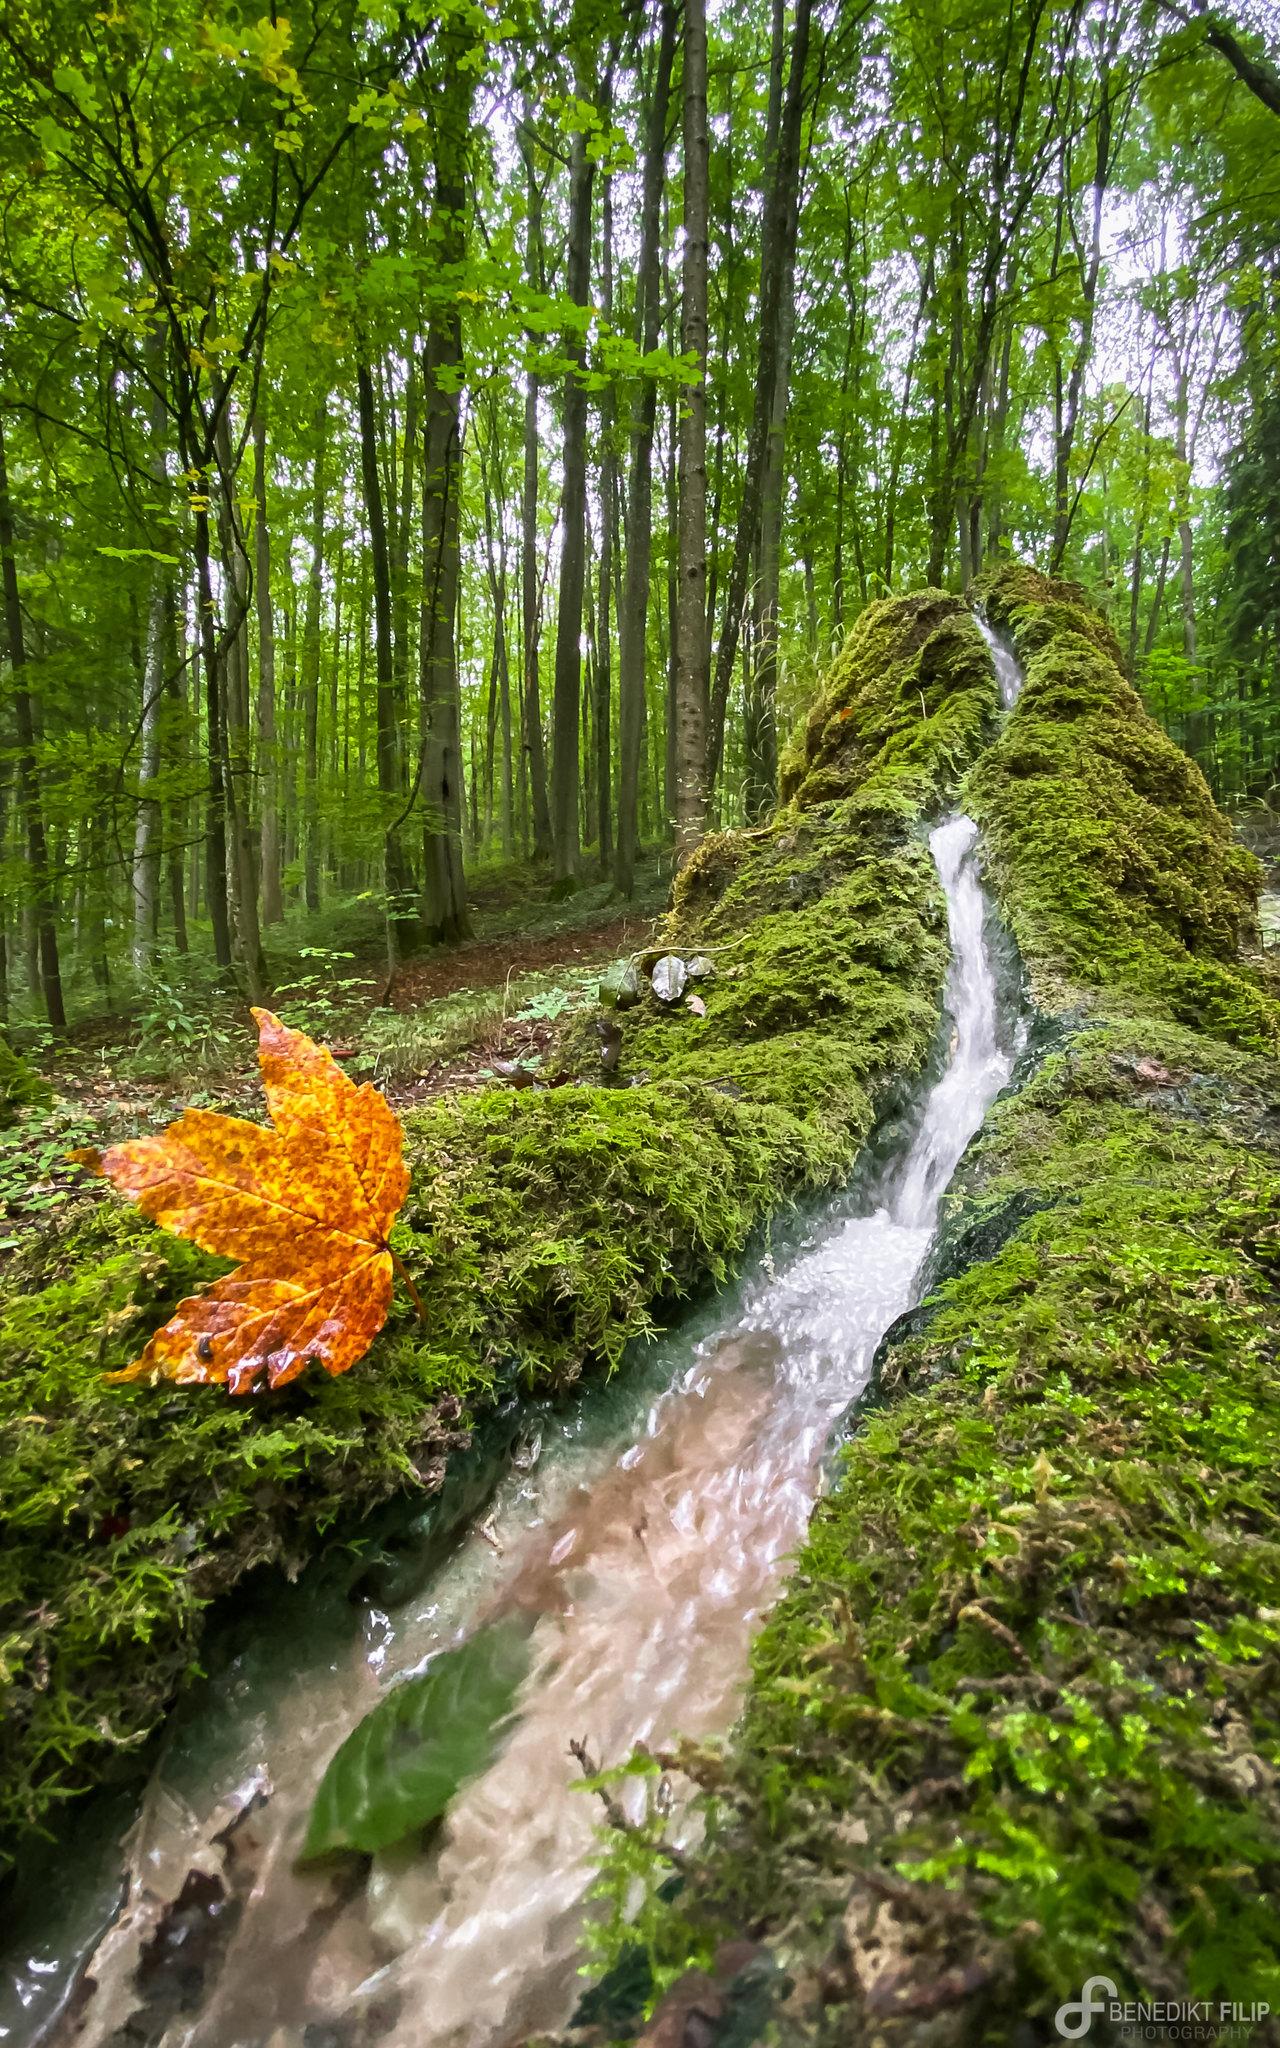 Stone Gutter fascinating natural phenomena